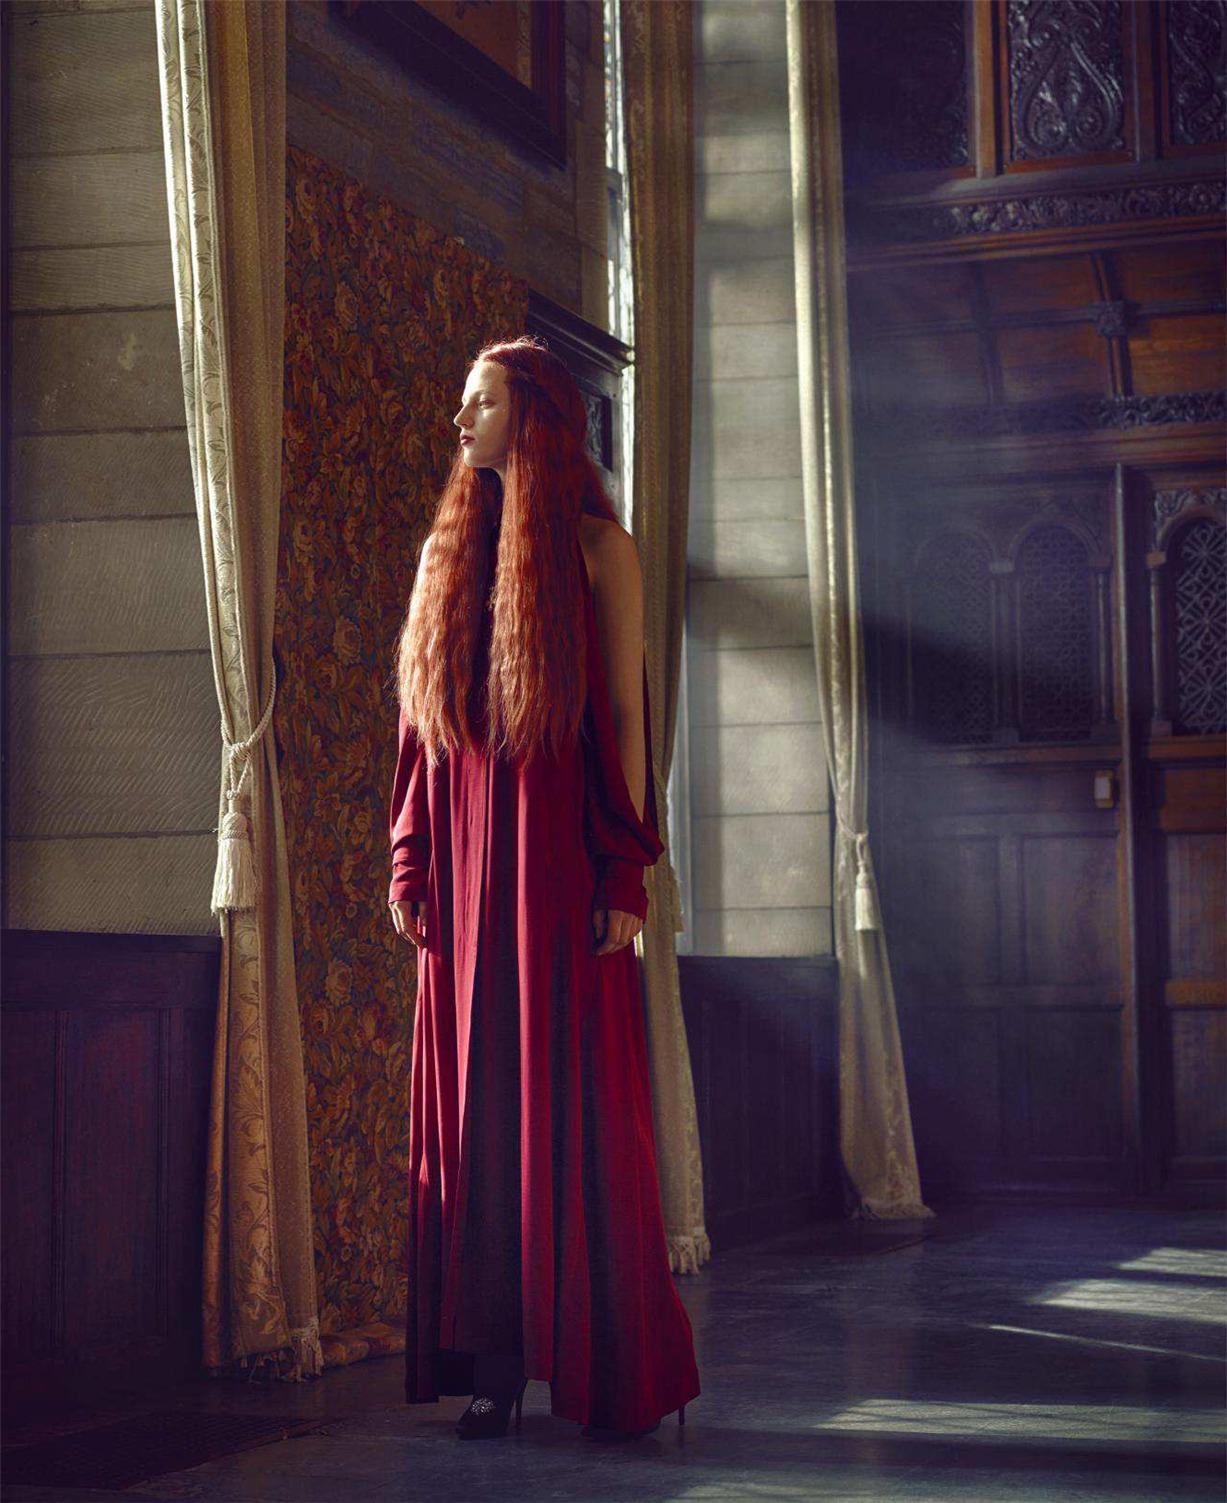 Мария, королева Шотландии и Елизавета I, королева Англии / Julia Banas and Lea Julian by Mark Seliger / Harper's Bazaar US september 2018